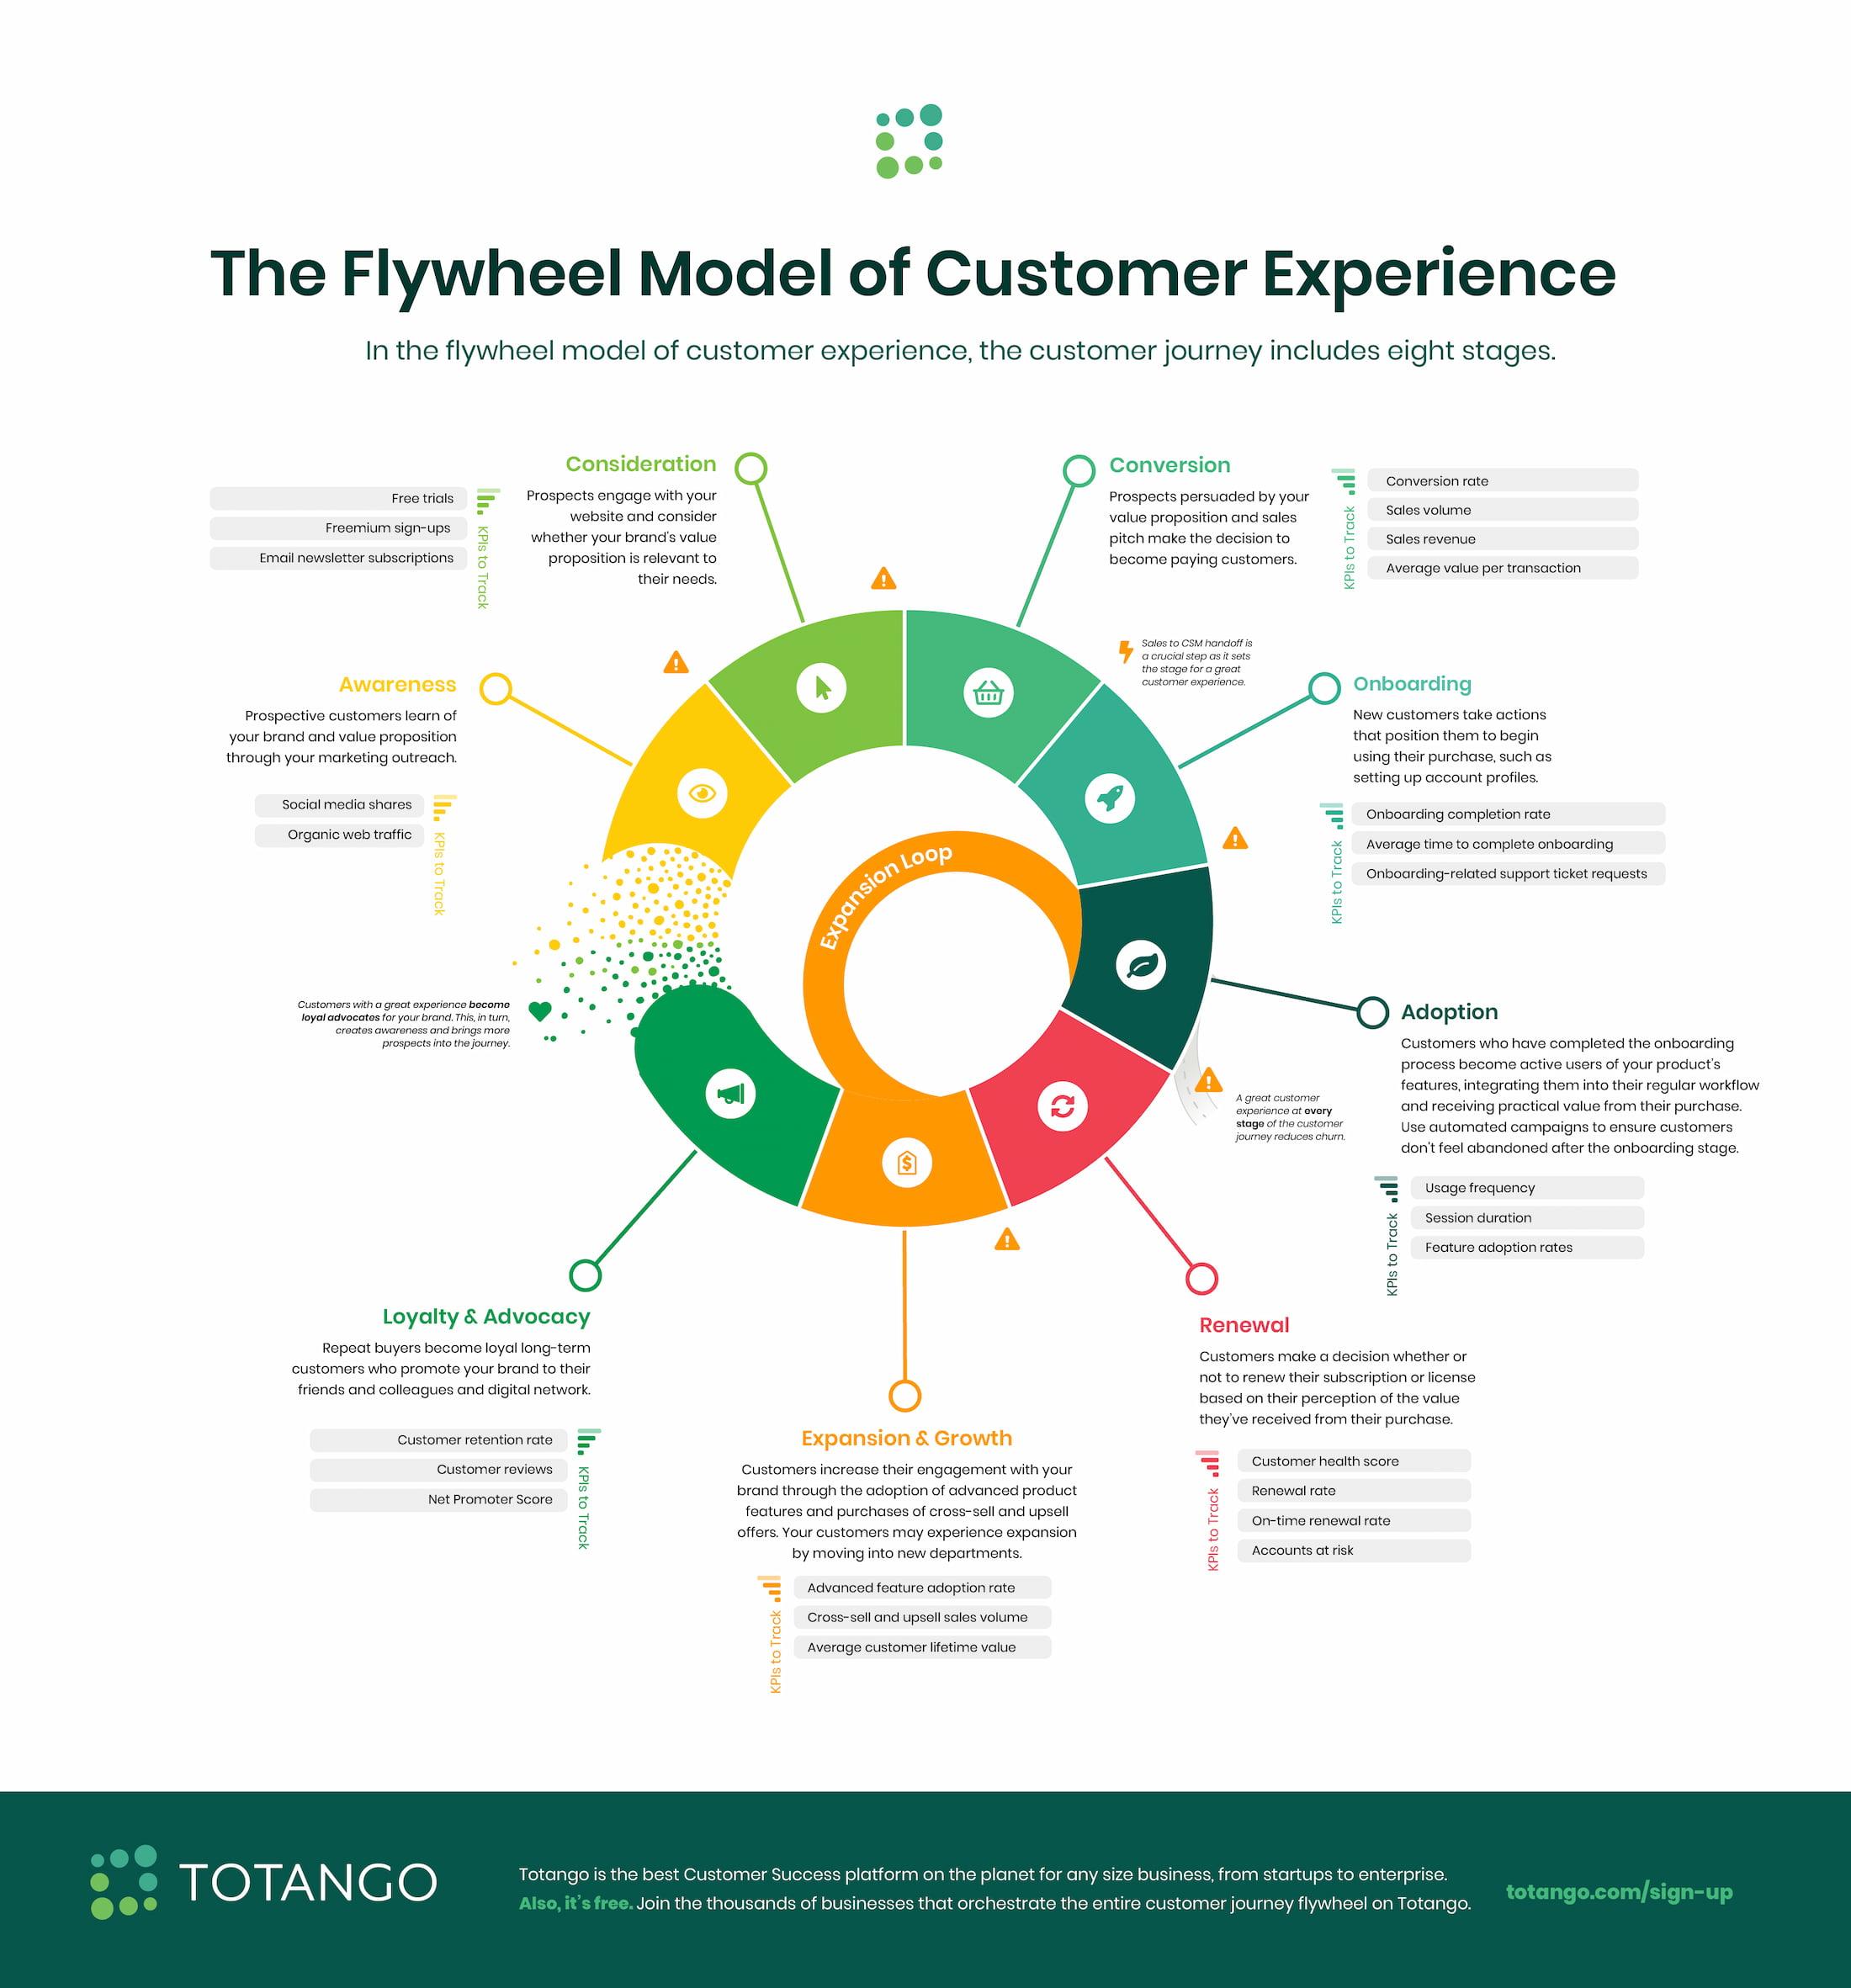 The Flywheel Model of Customer Experience